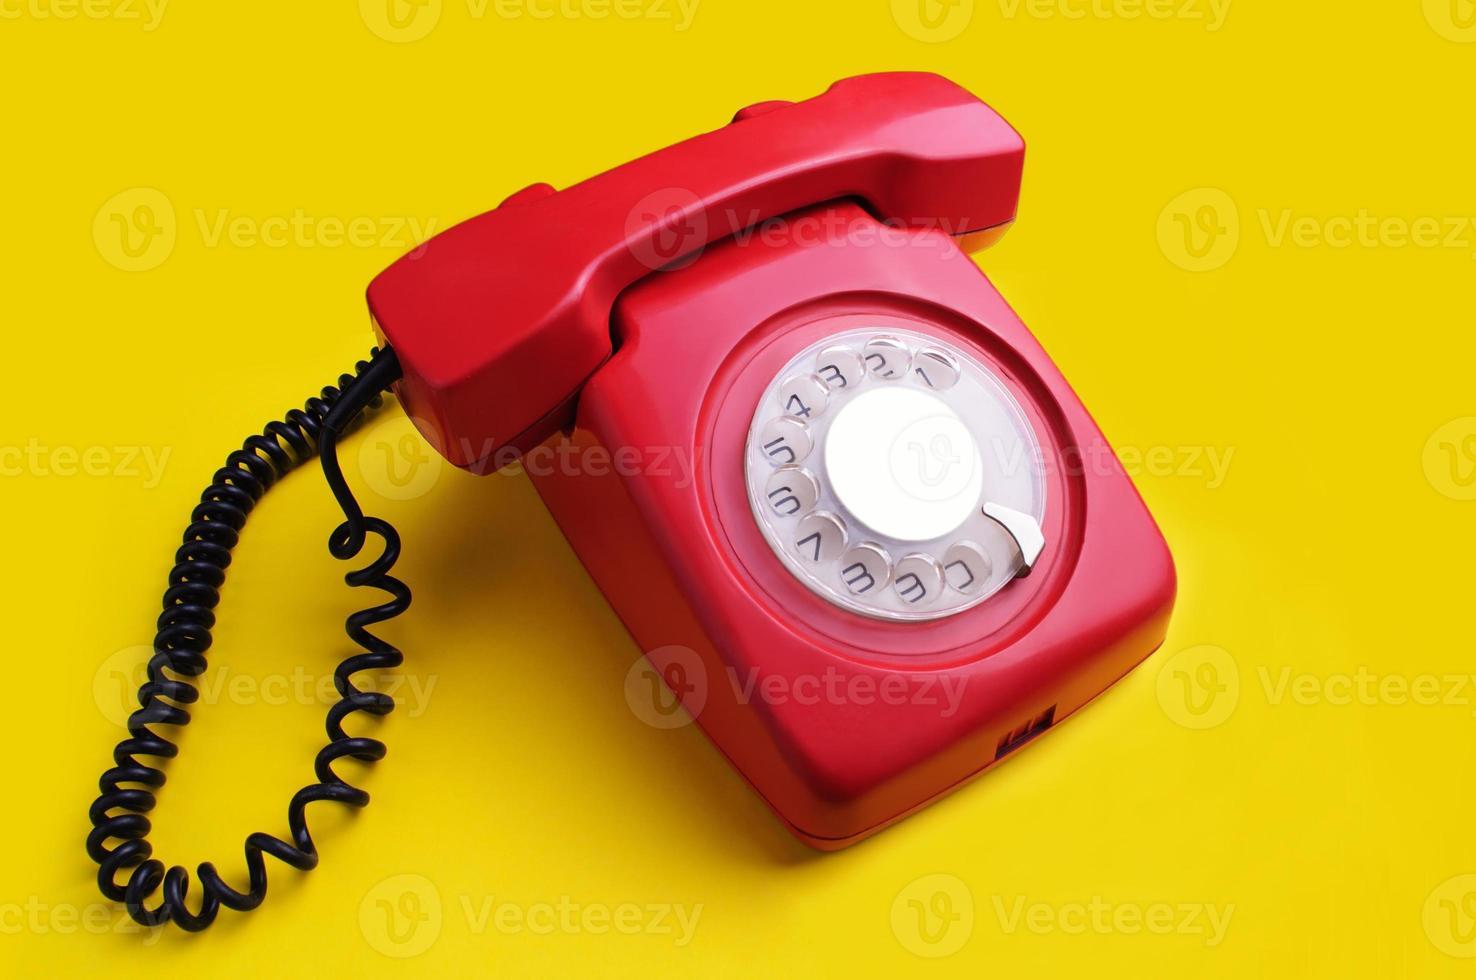 Red retro telephone on yellow background photo